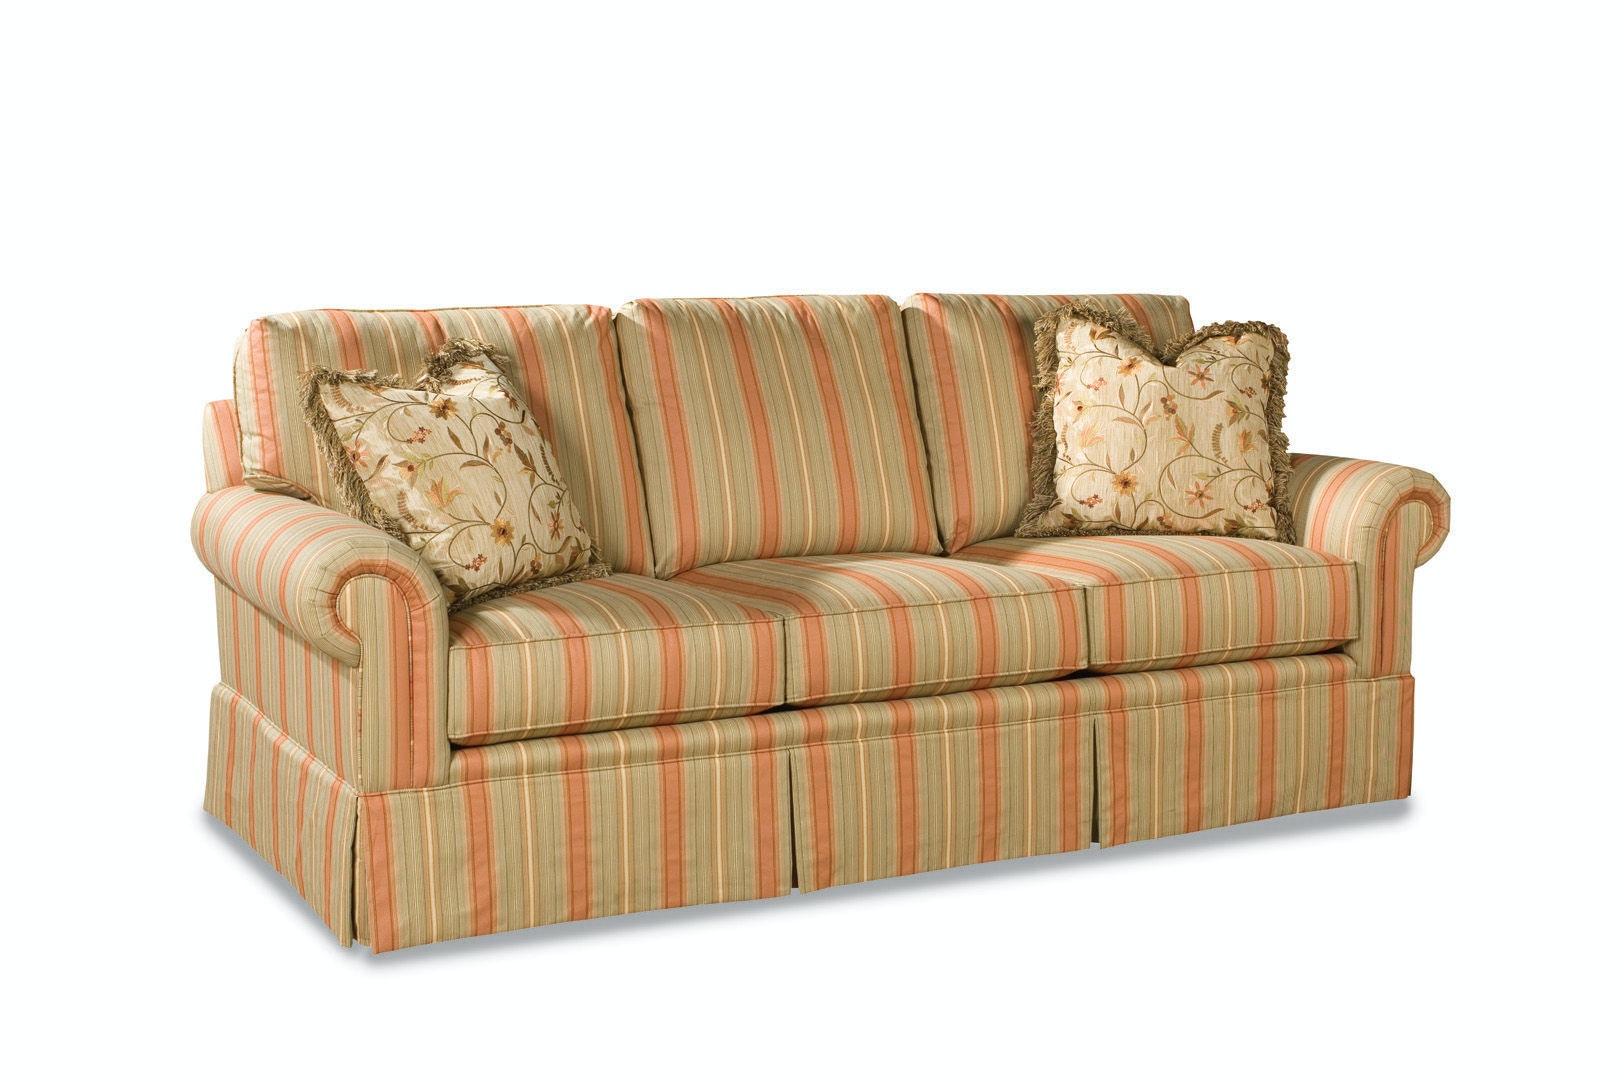 huntington house living room sofa 2053 20 carol house furniture rh carolhouse com carol house sofa sleepers Carol House Furniture Catalog